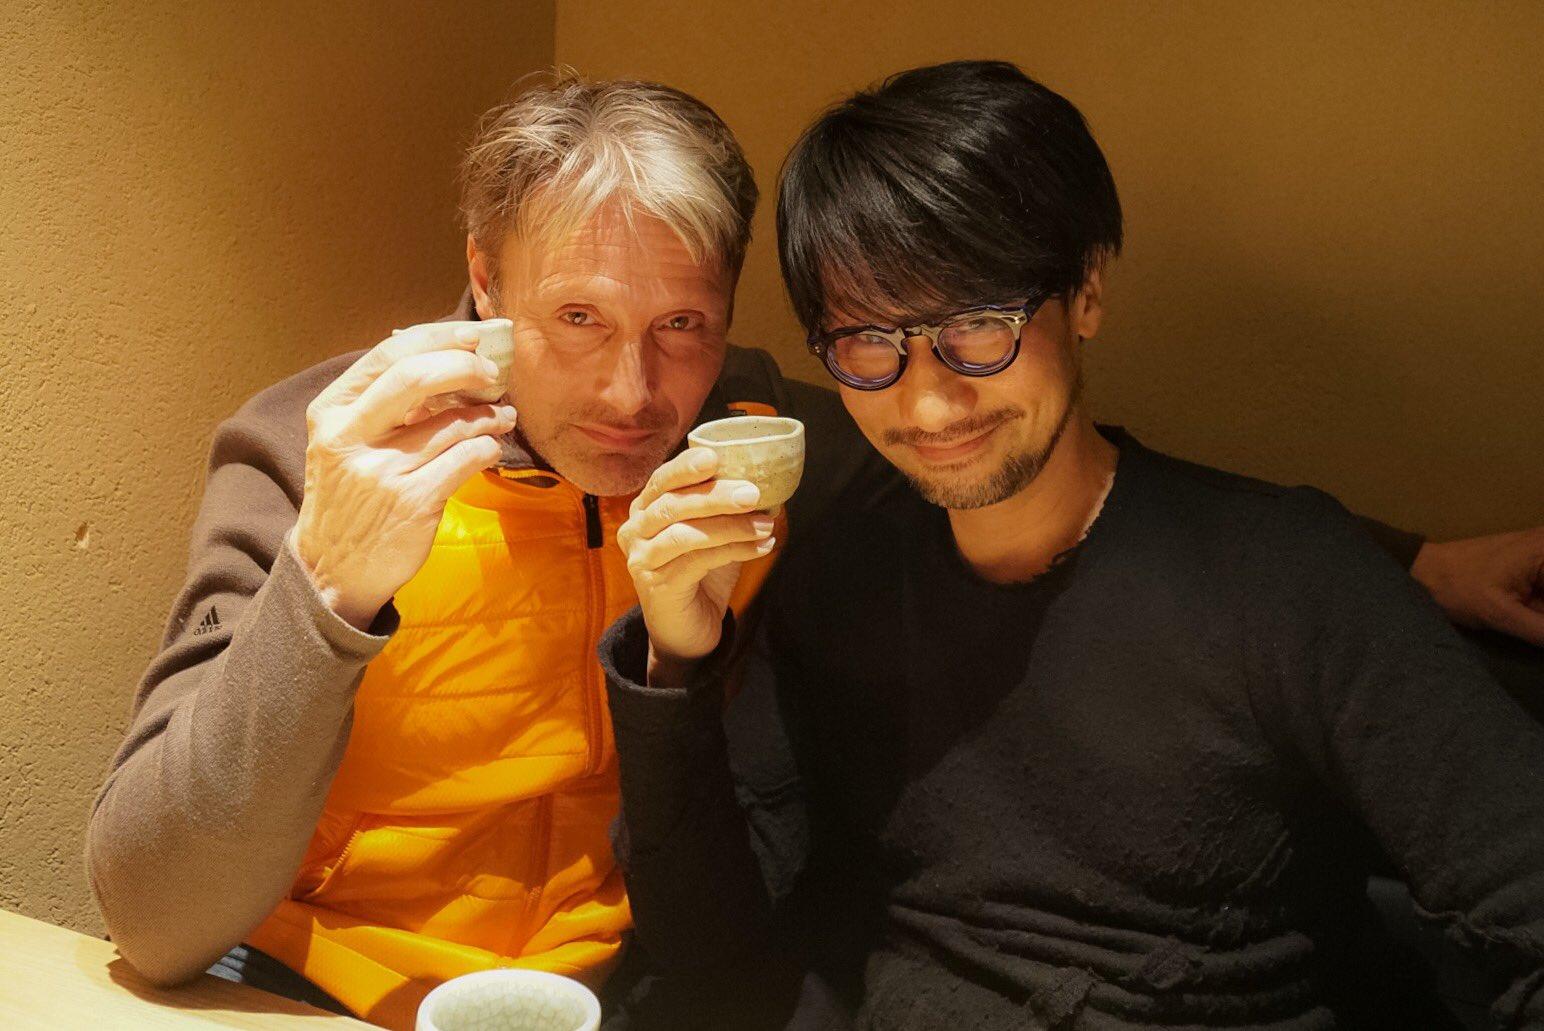 Mads Mikkelsen et Hideo Kojima, le 25 janvier 2017